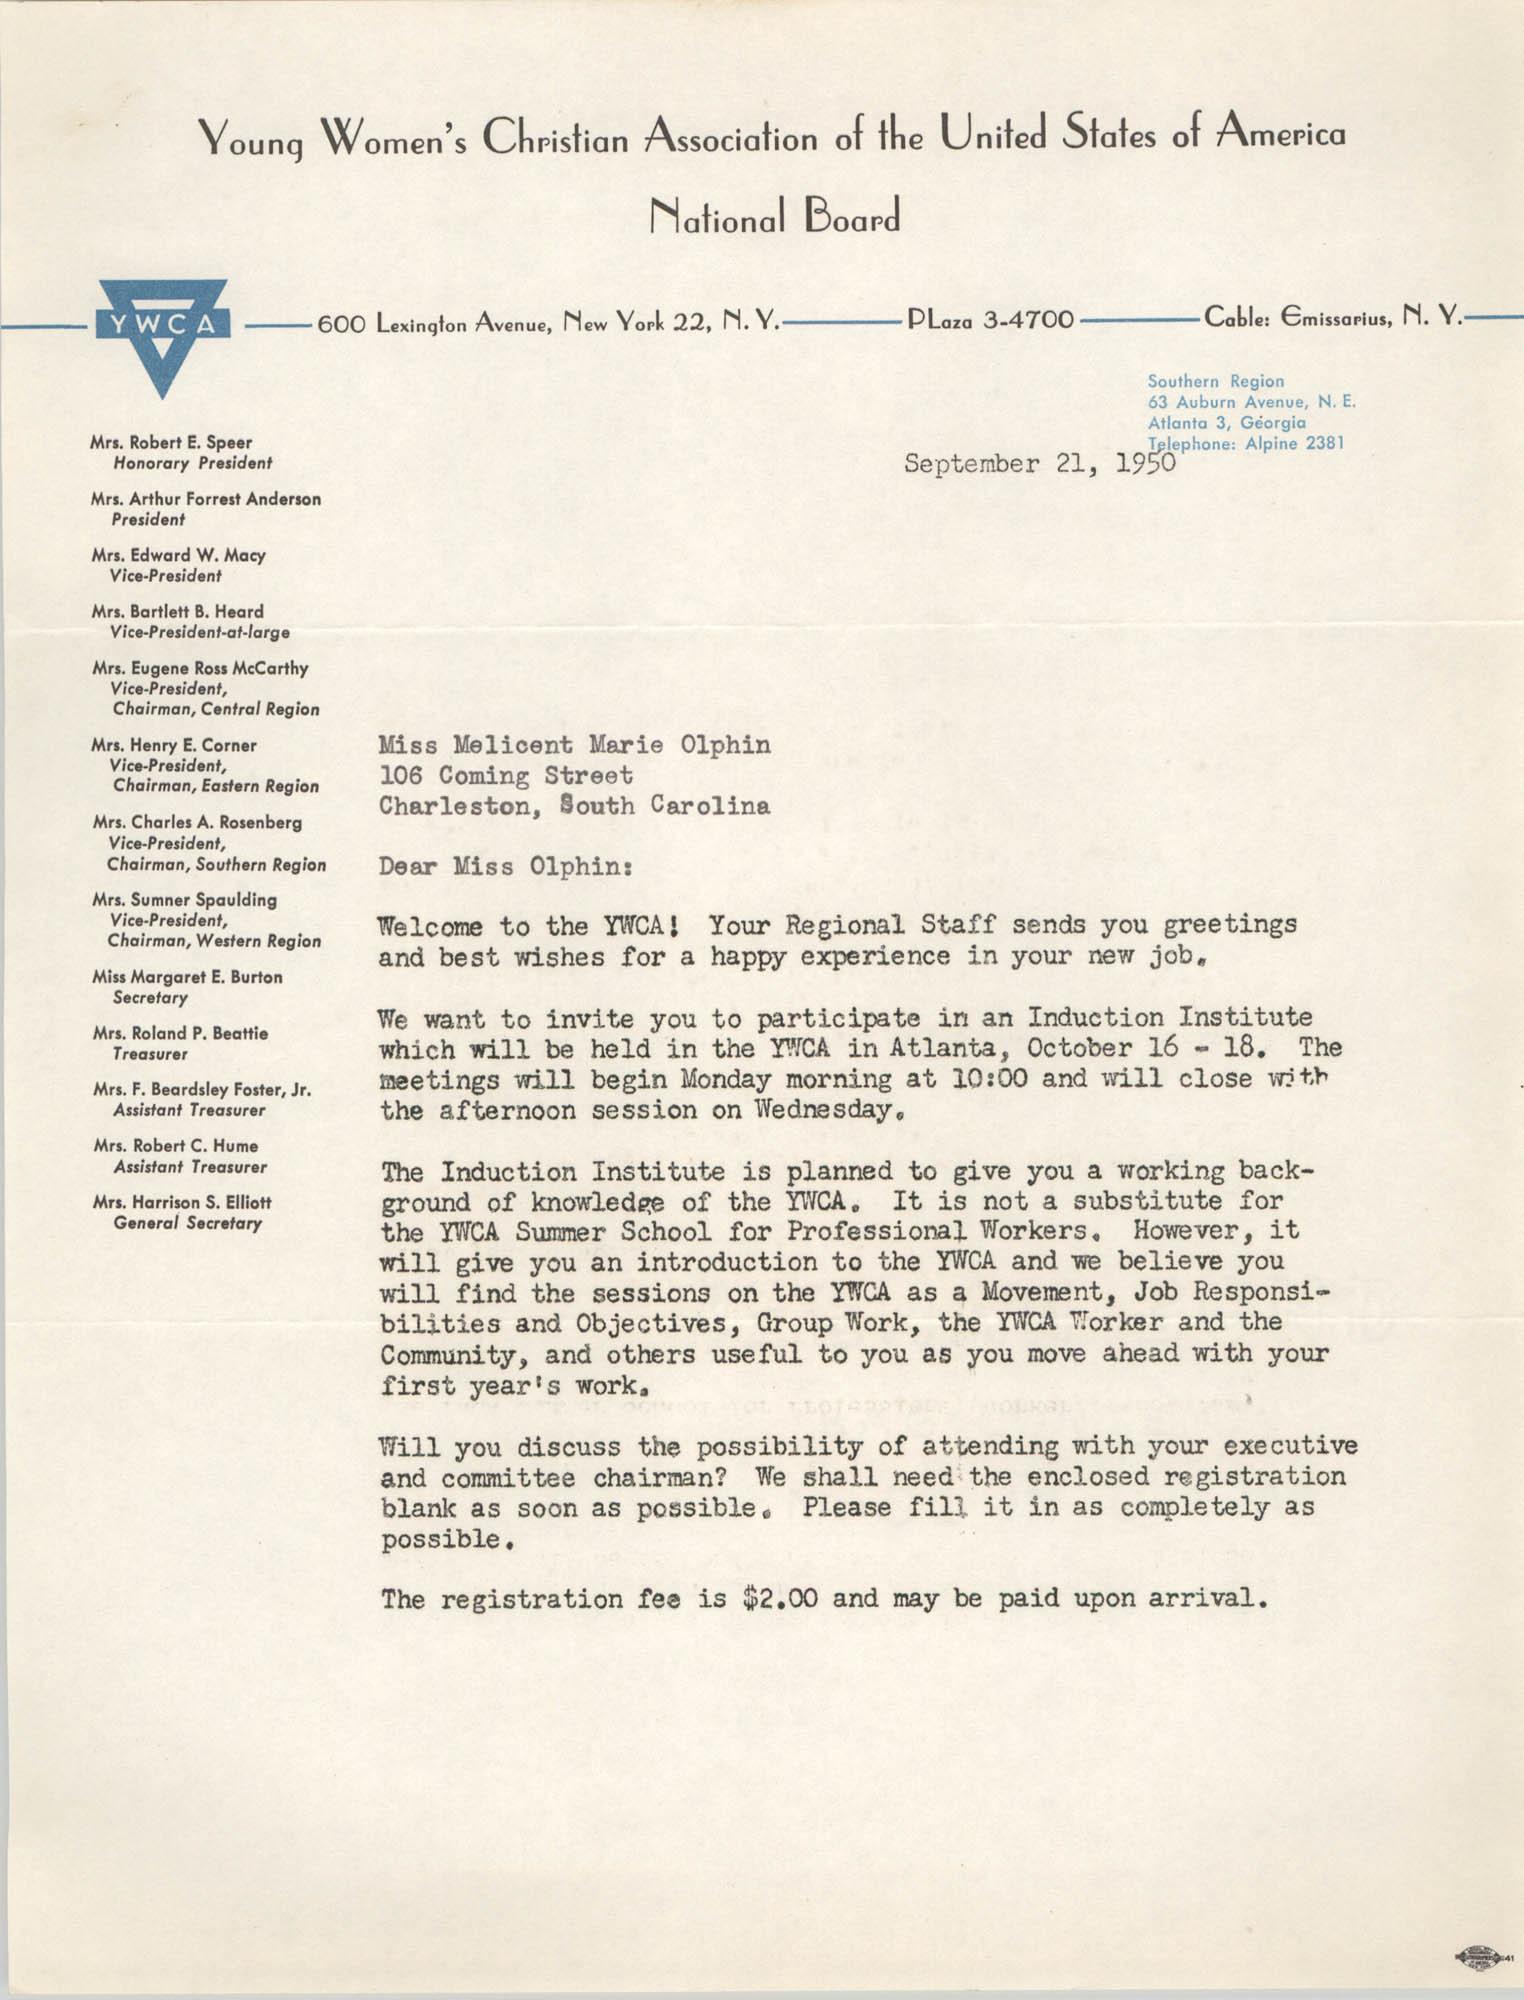 Letter from Mary Jane Willett to Melicent Marie Olphin, September 21, 1950